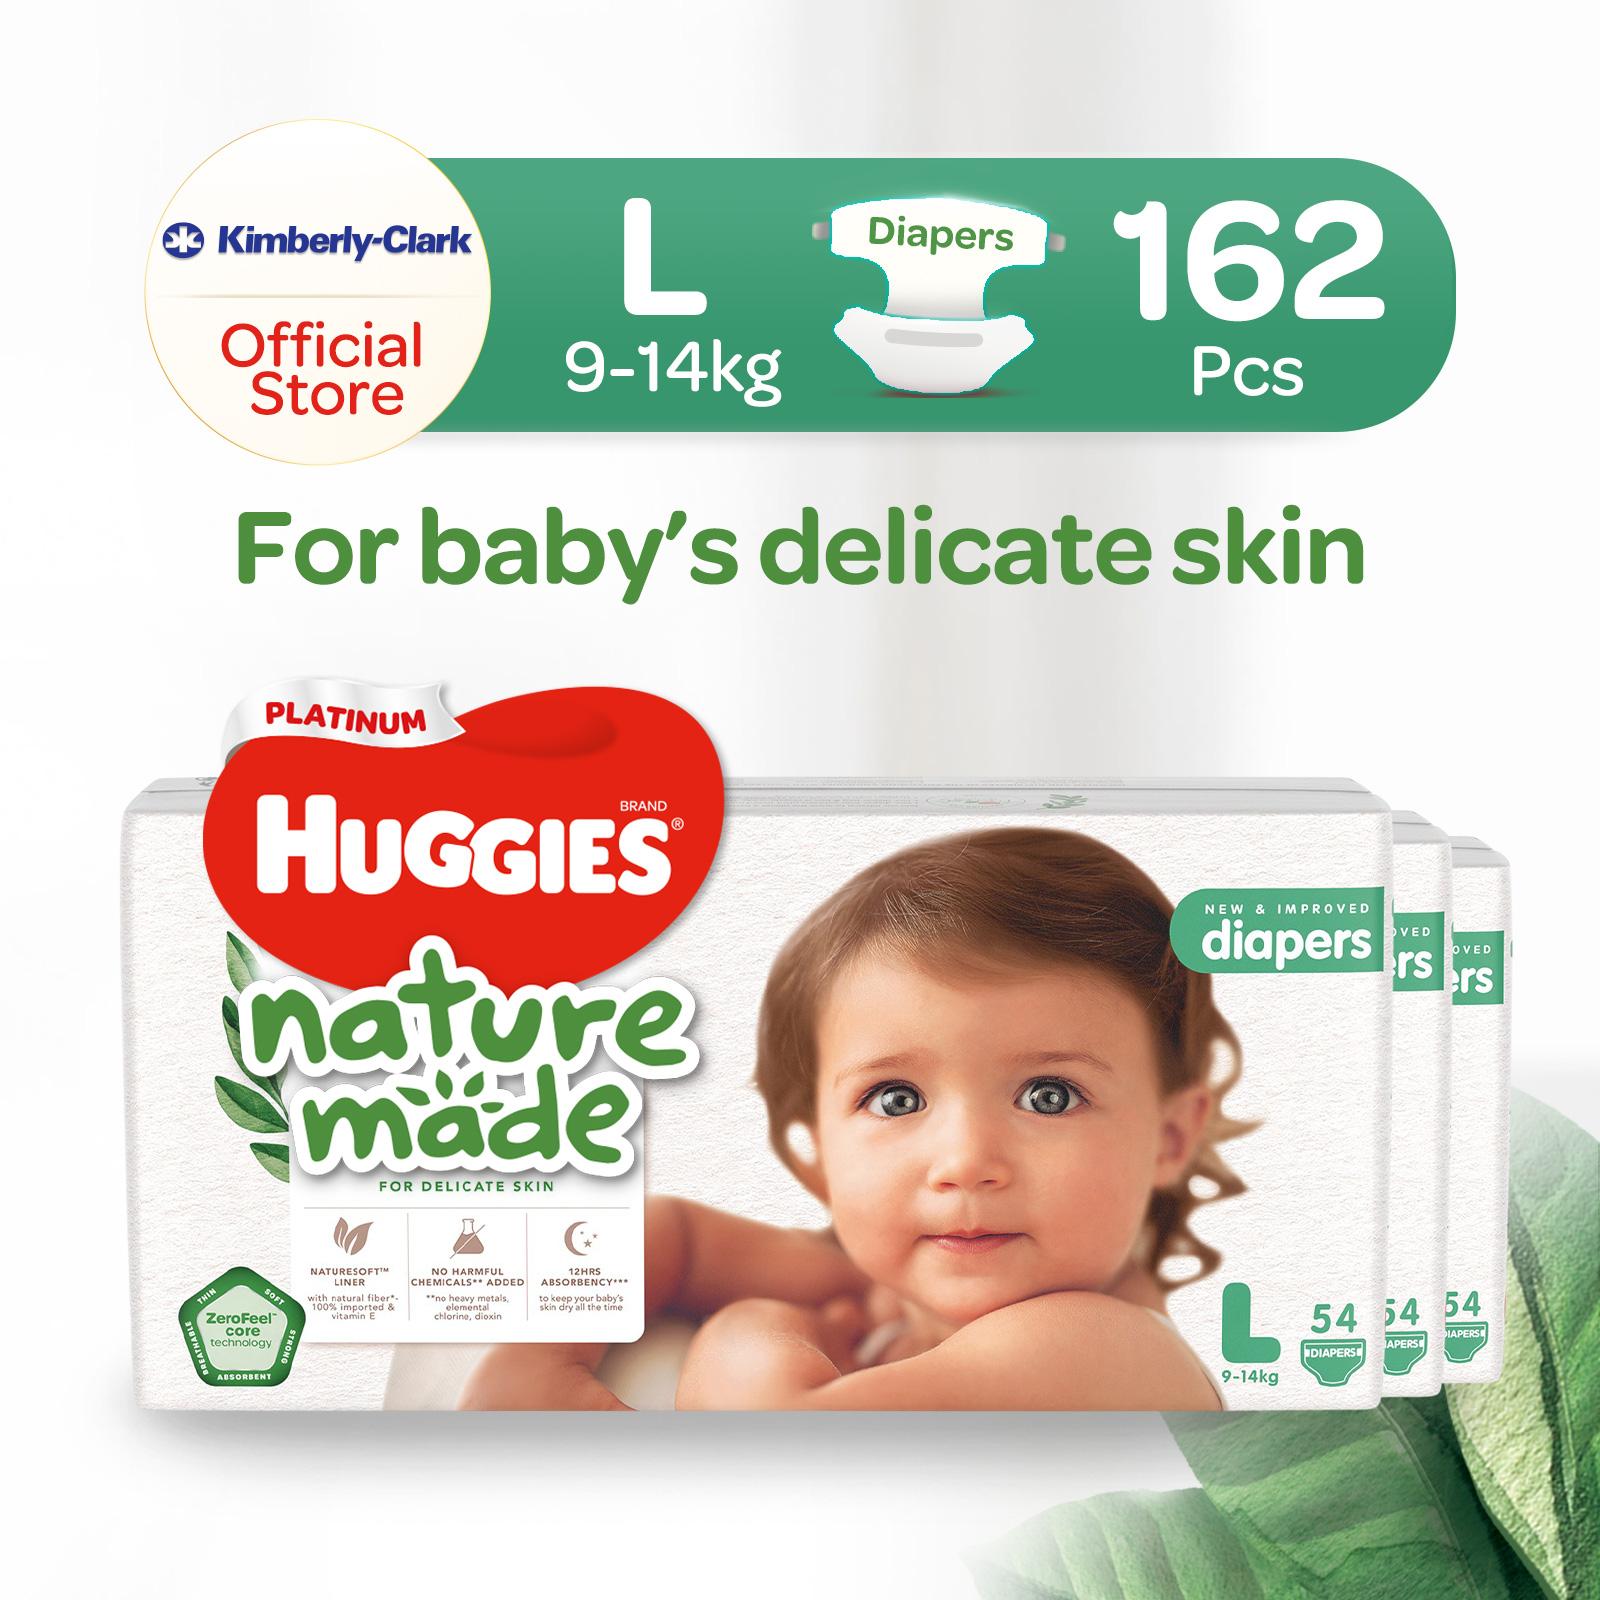 [1 Carton] Huggies Platinum Naturemade Tape Diapers L x3 162pcs